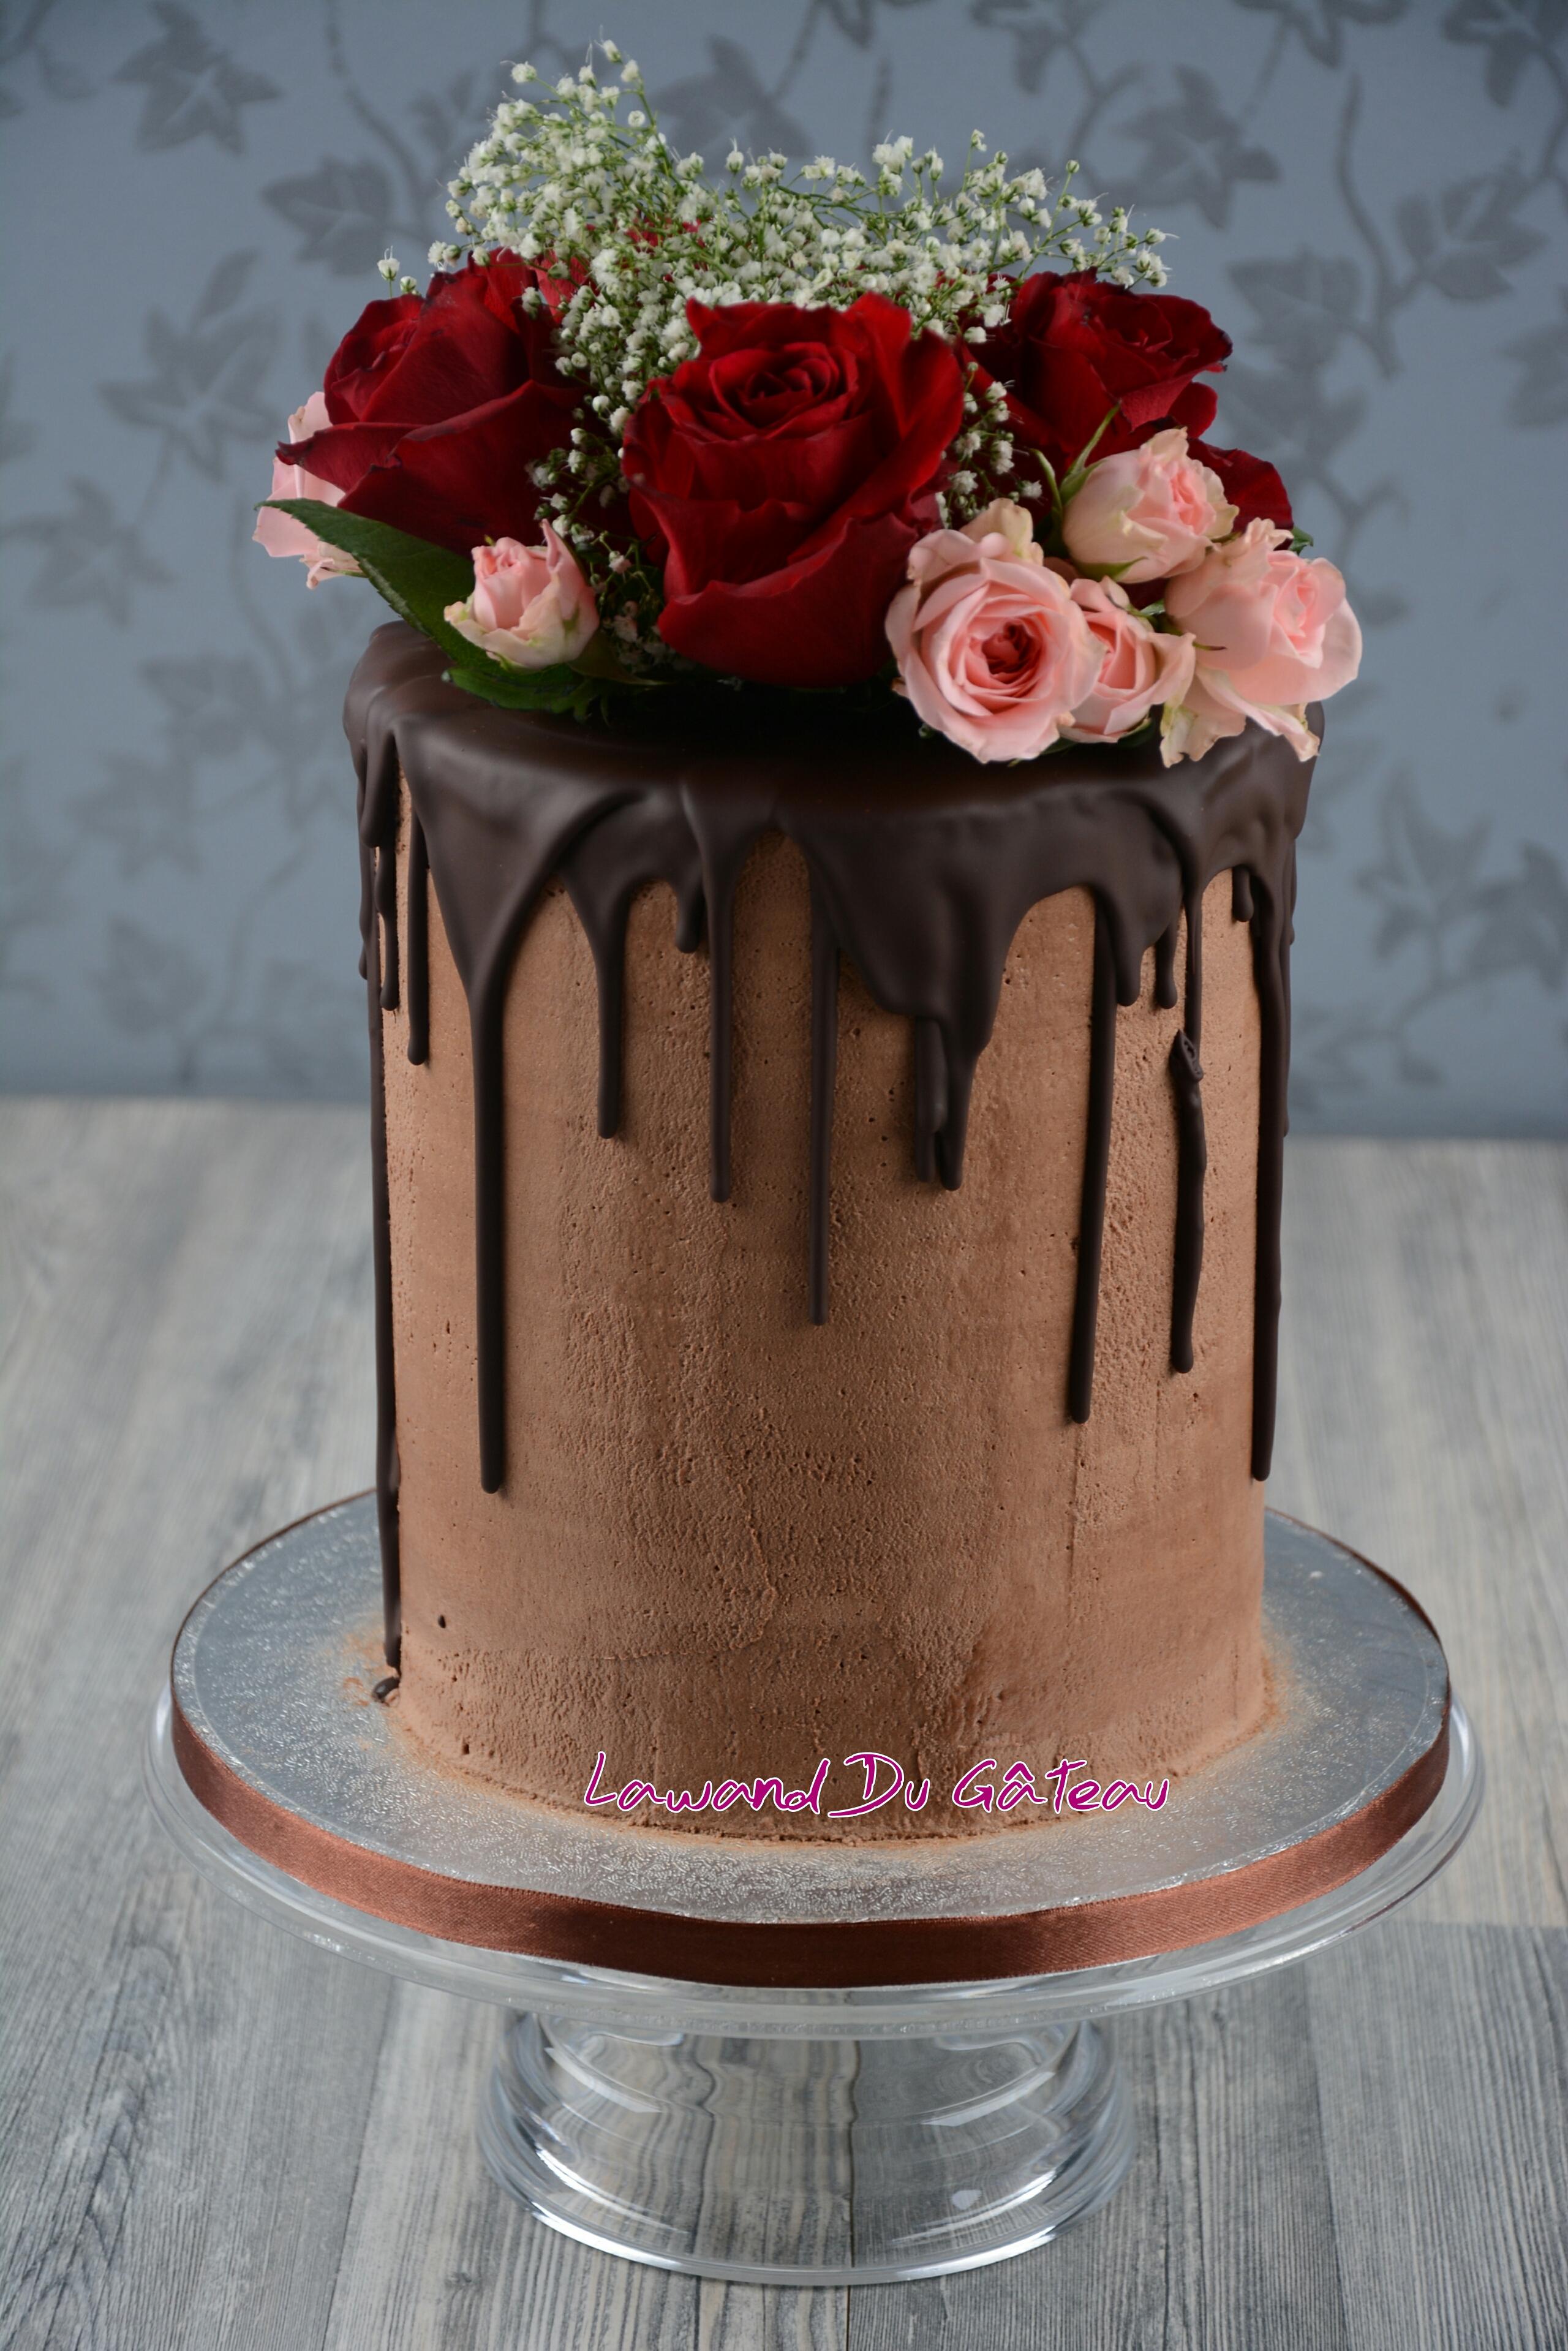 Chocolate colored drip wedding cake with sugar flowers